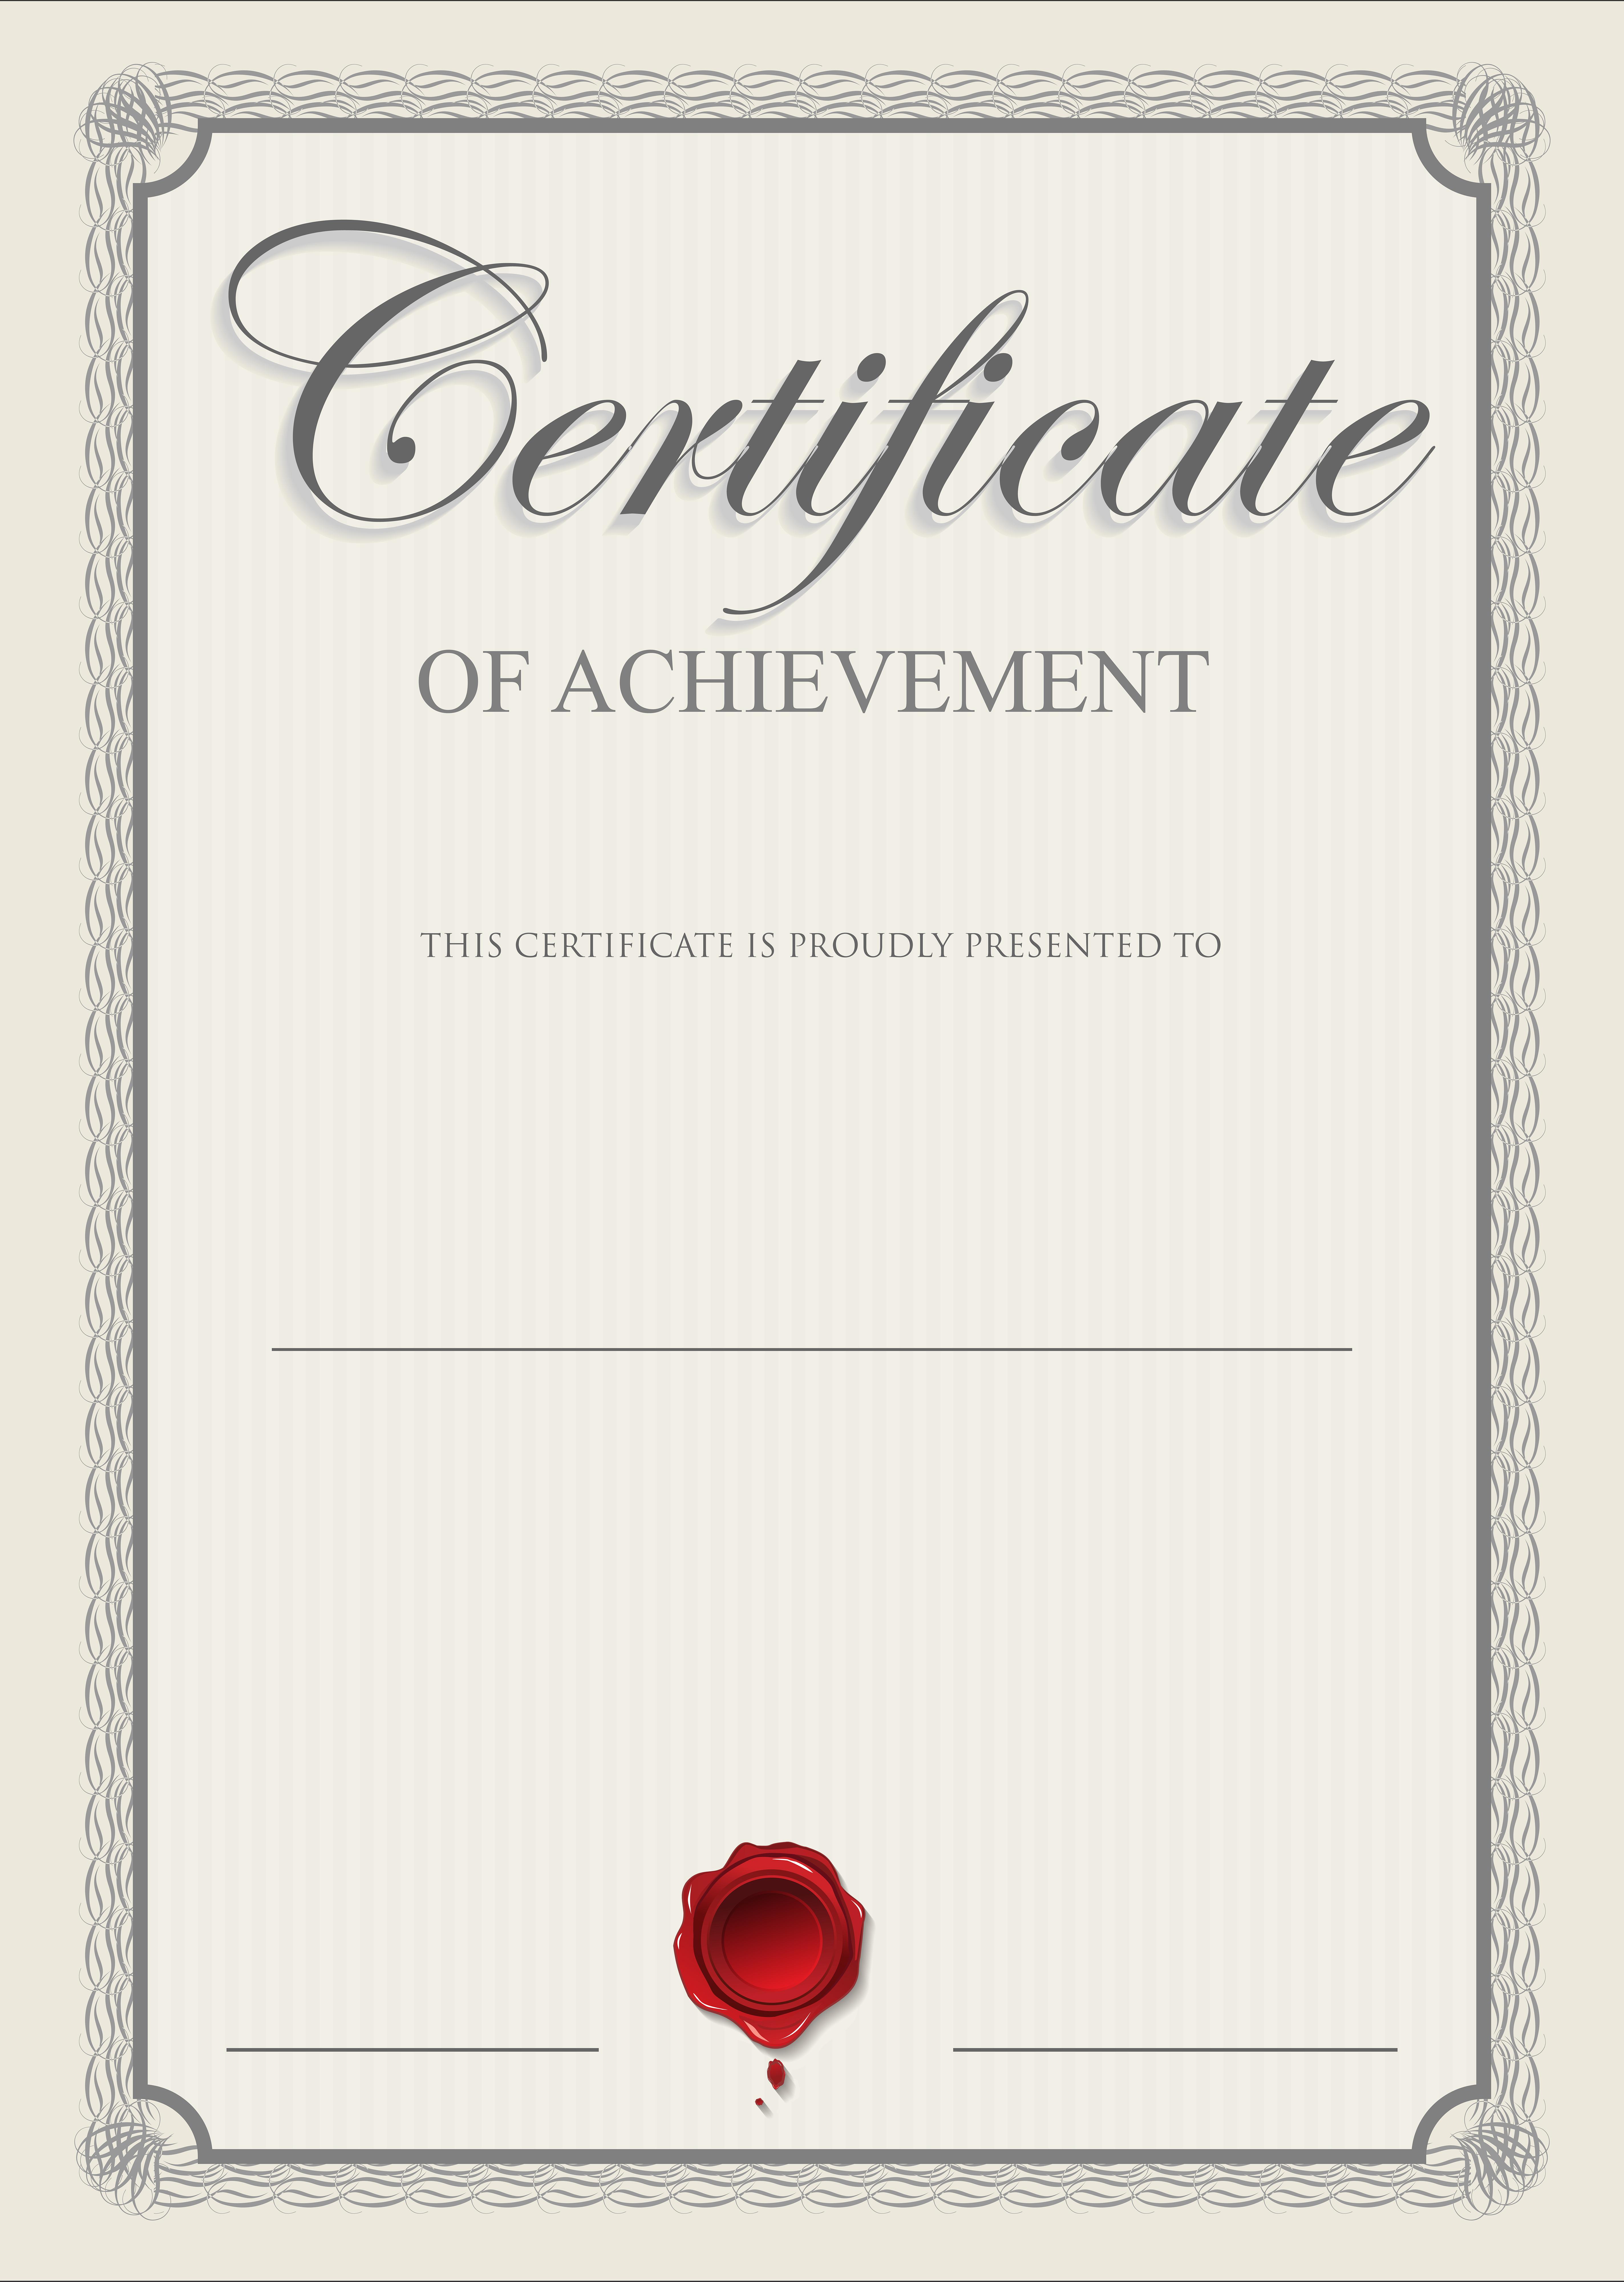 Certificate clipart. Clip art png image